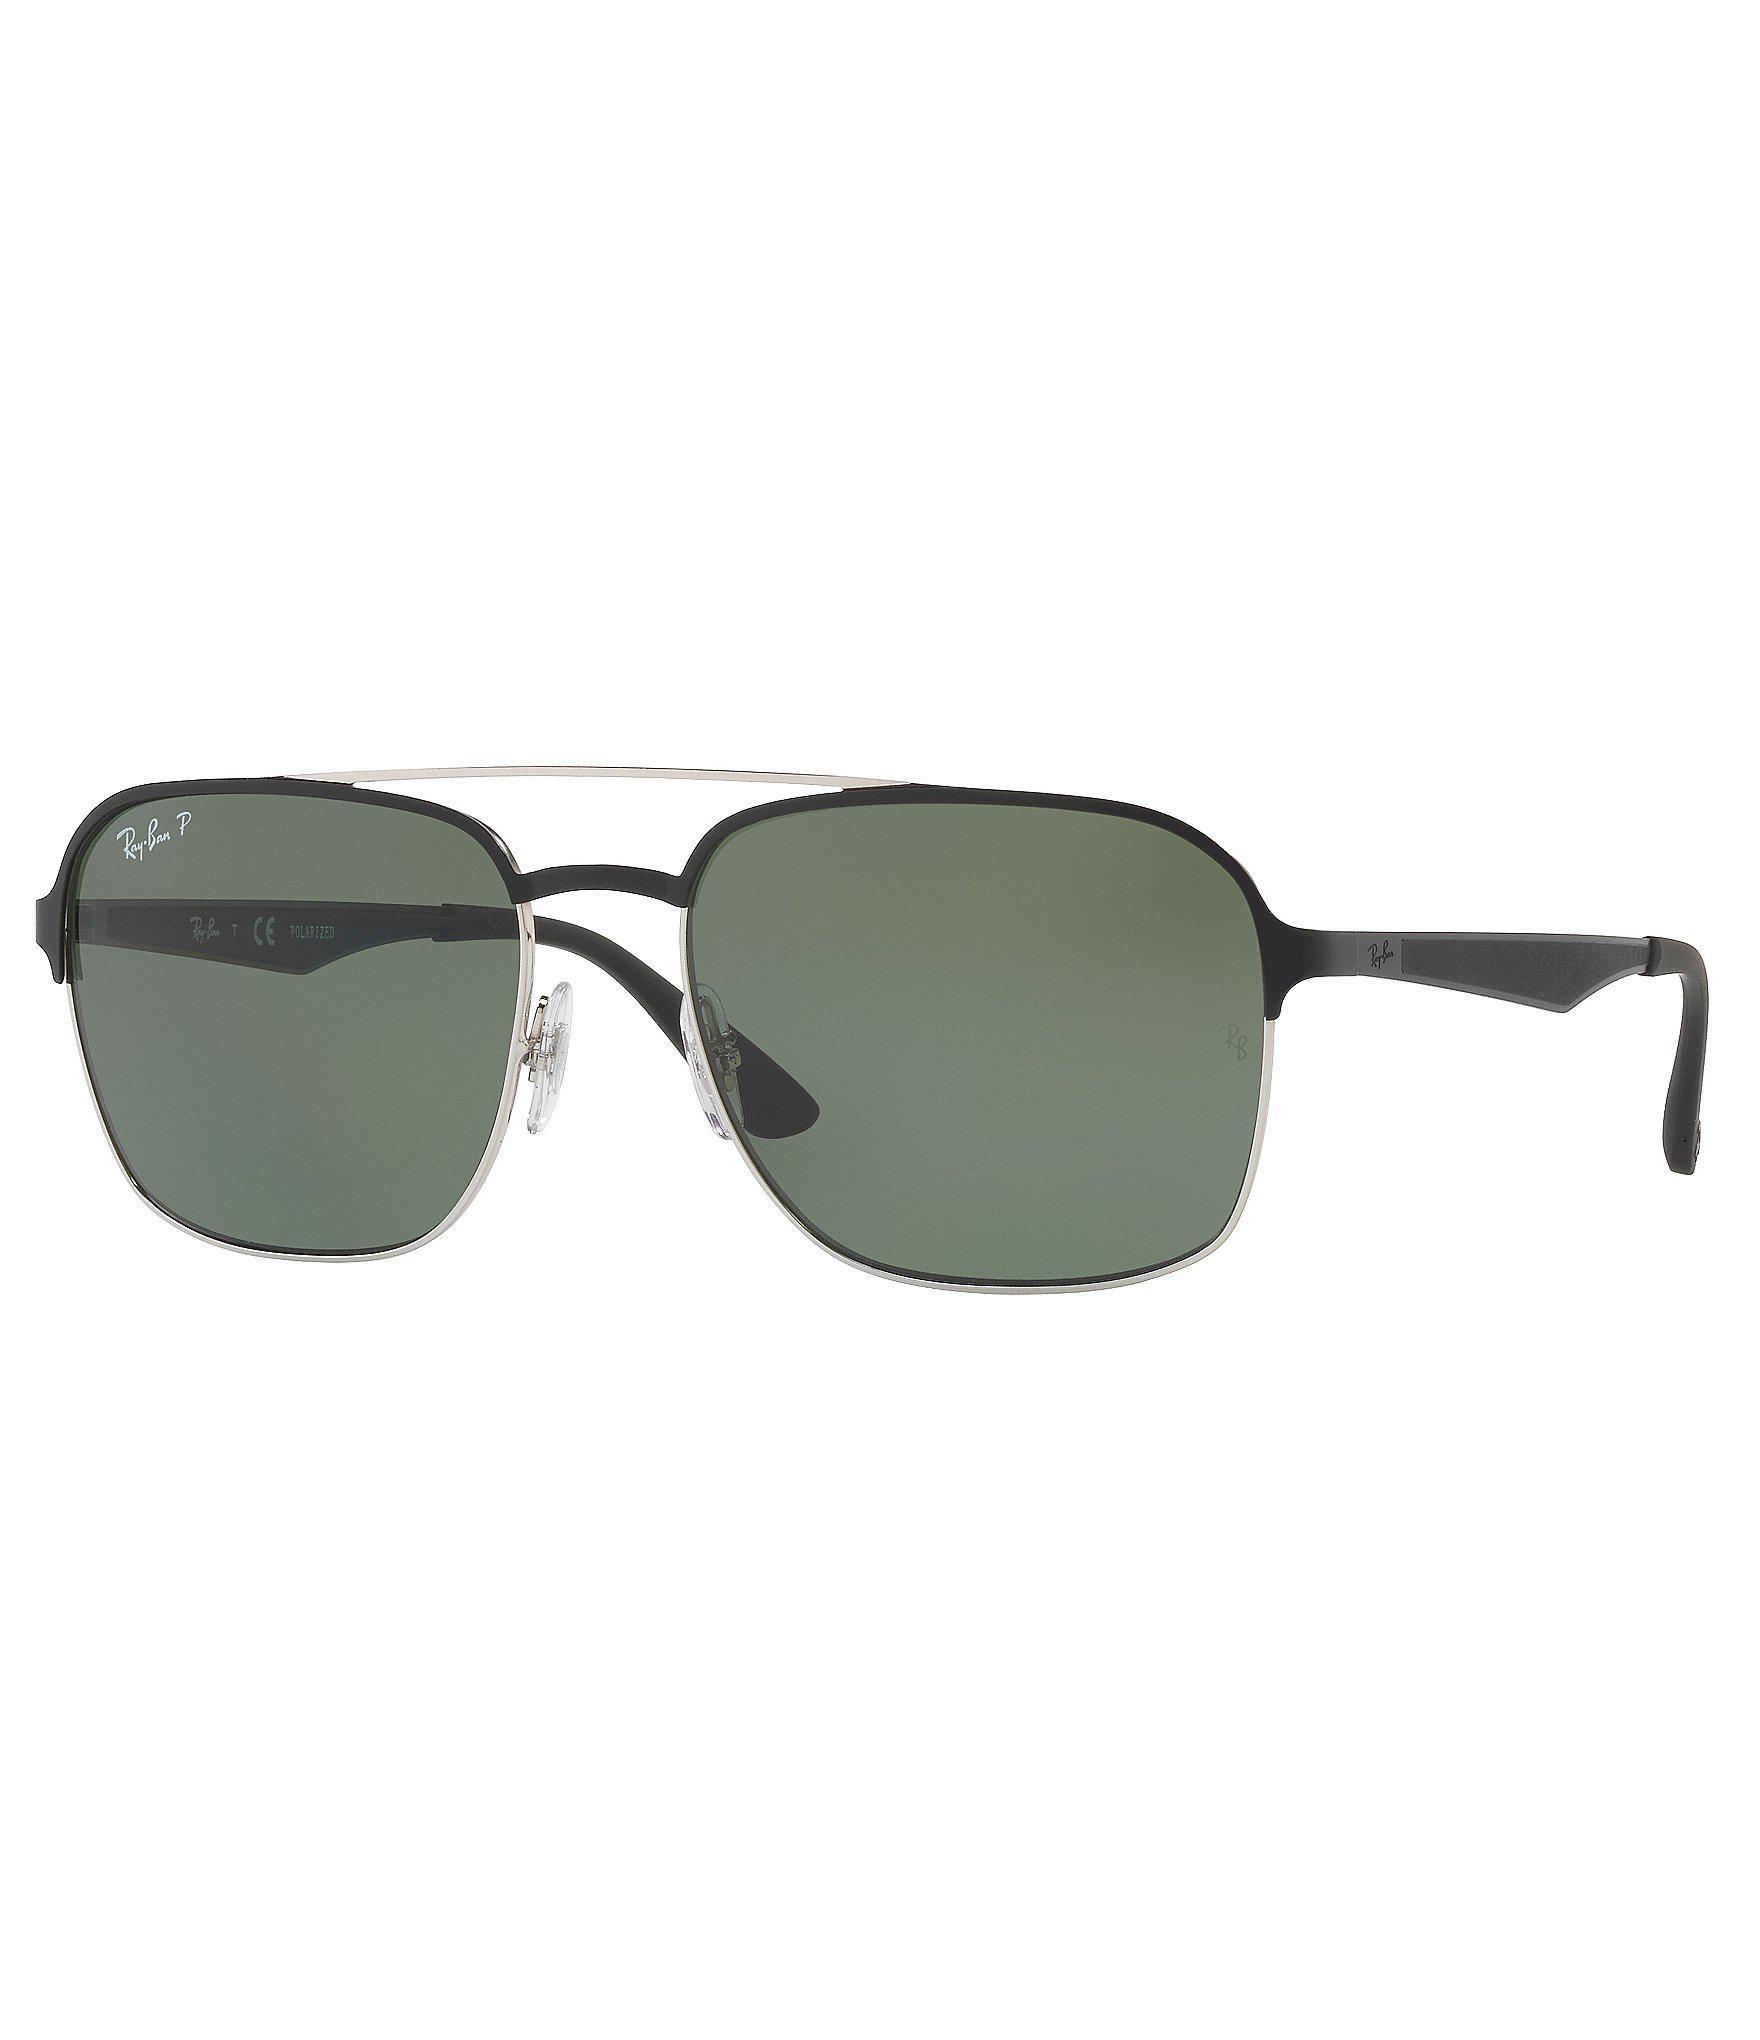 1dbdae2a28 Lyst - Ray-Ban Polarized Navigator Sunglasses for Men